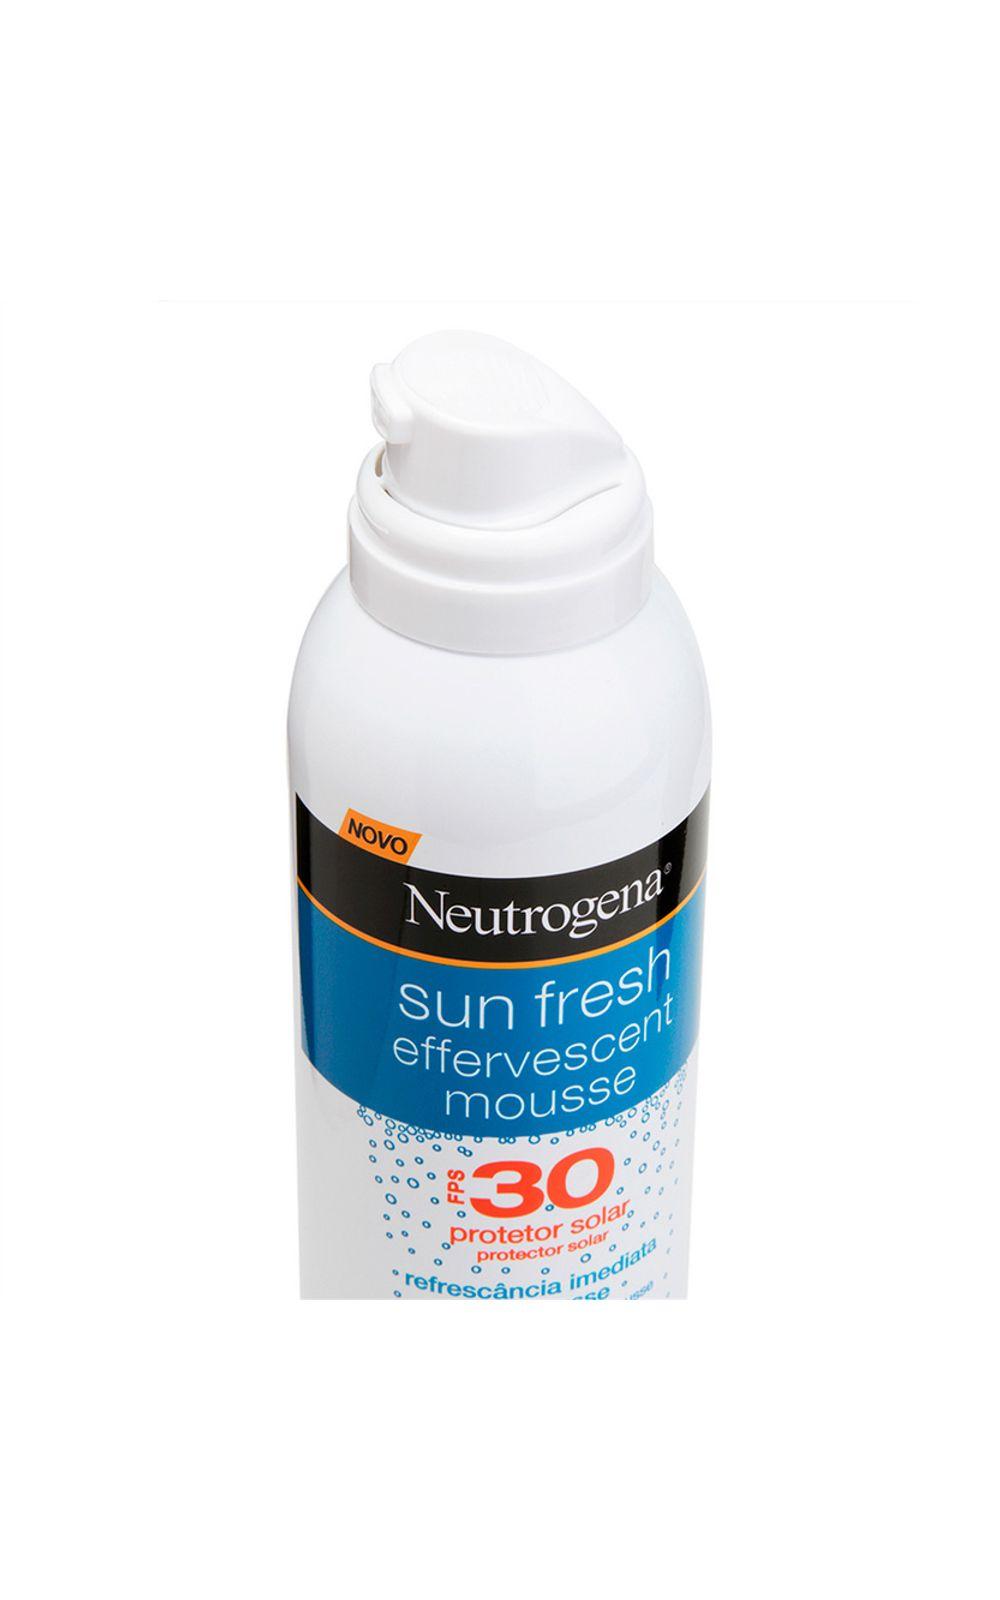 Foto 2 - Protetor Solar Neutrogena Sun Fresh Mousse Efervescente FPS 30 - 200ml